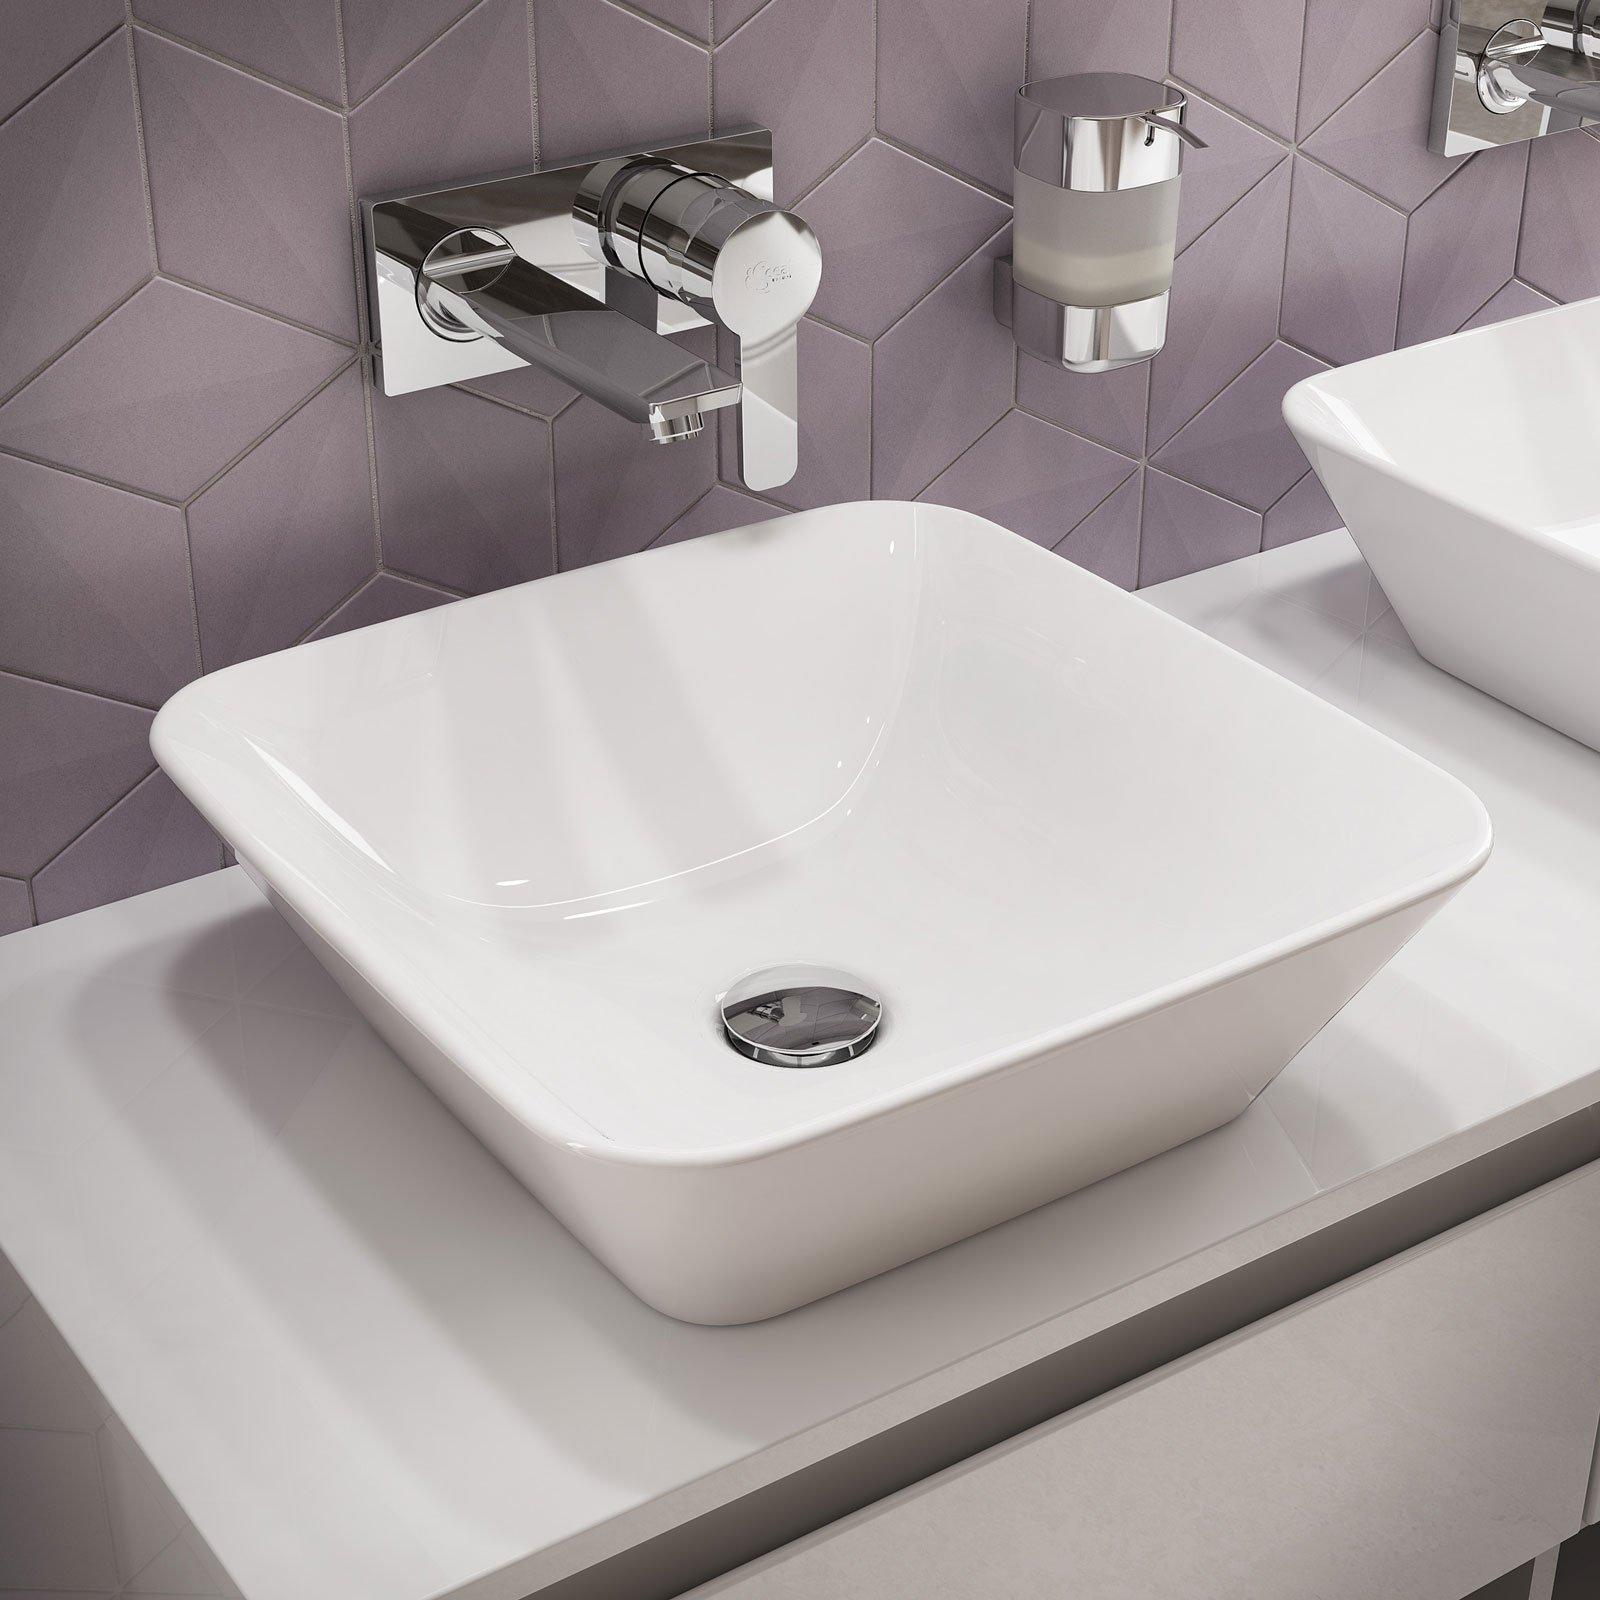 Best Ideal Torino Prezzi Photos - acrylicgiftware.us ...